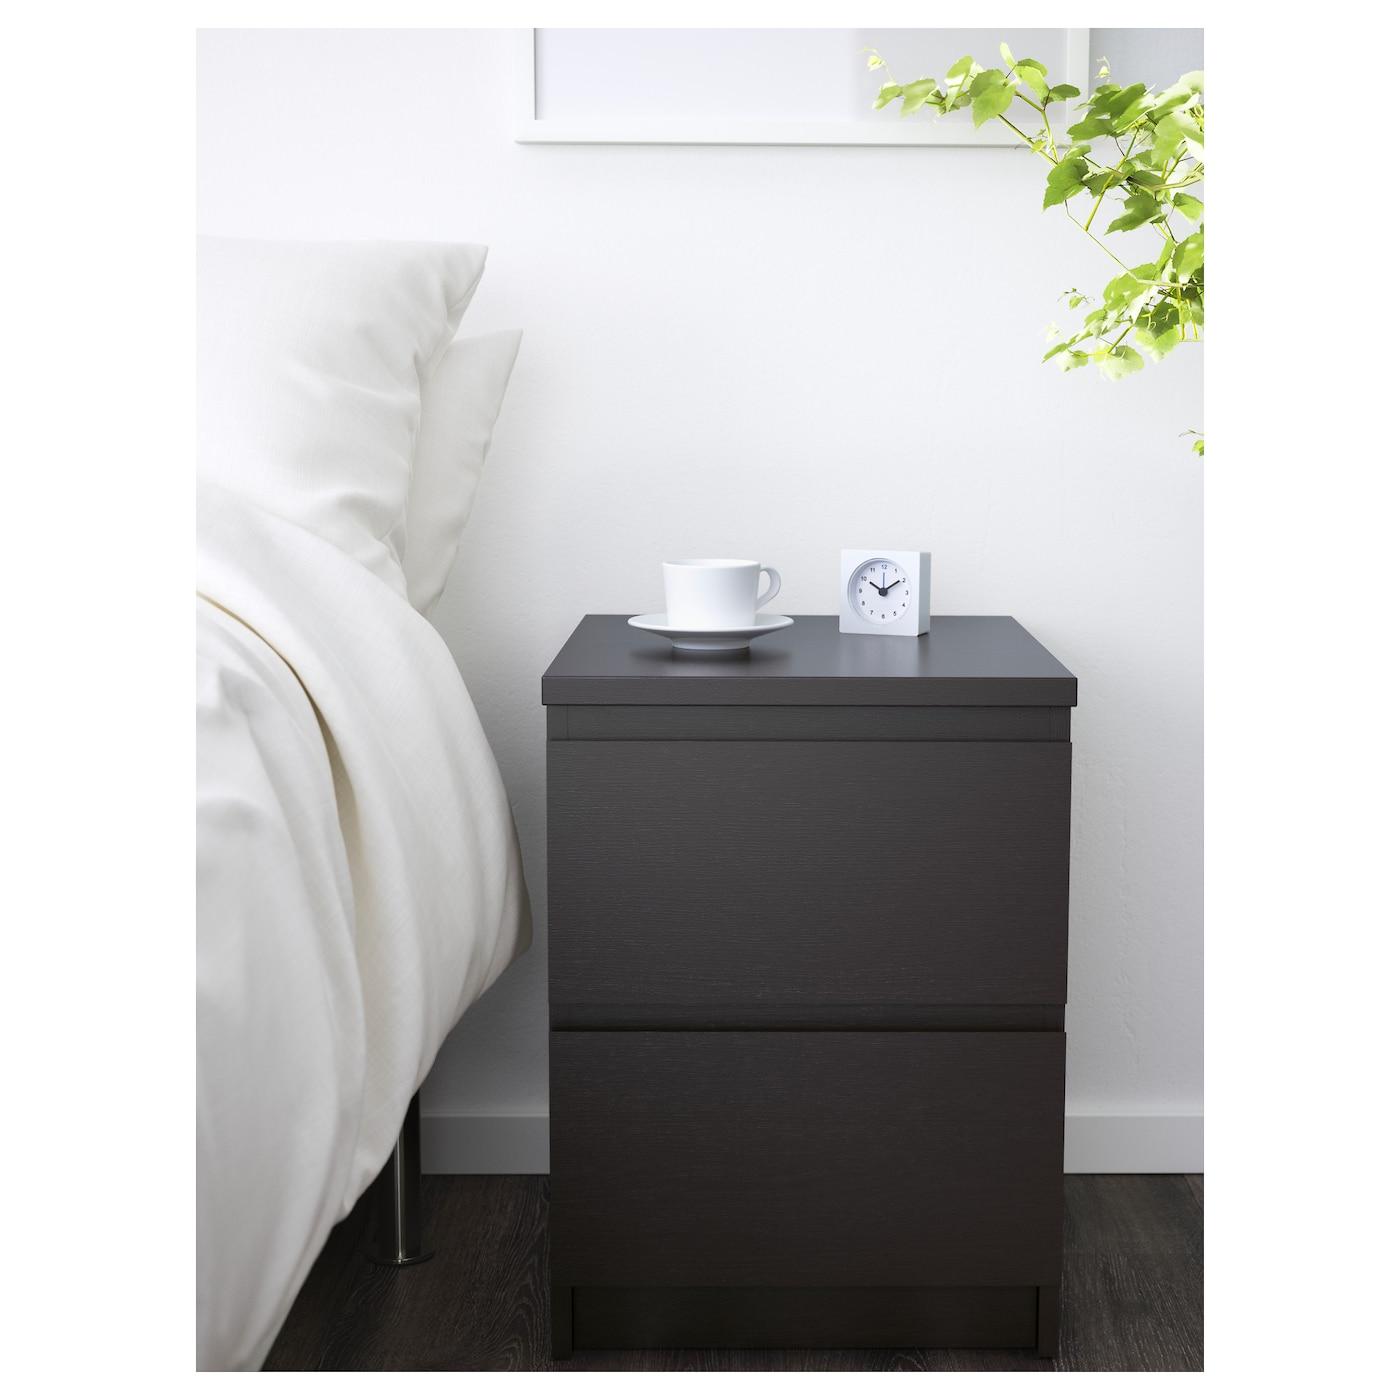 malm commode 2 tiroirs brun noir 40x55 cm ikea. Black Bedroom Furniture Sets. Home Design Ideas